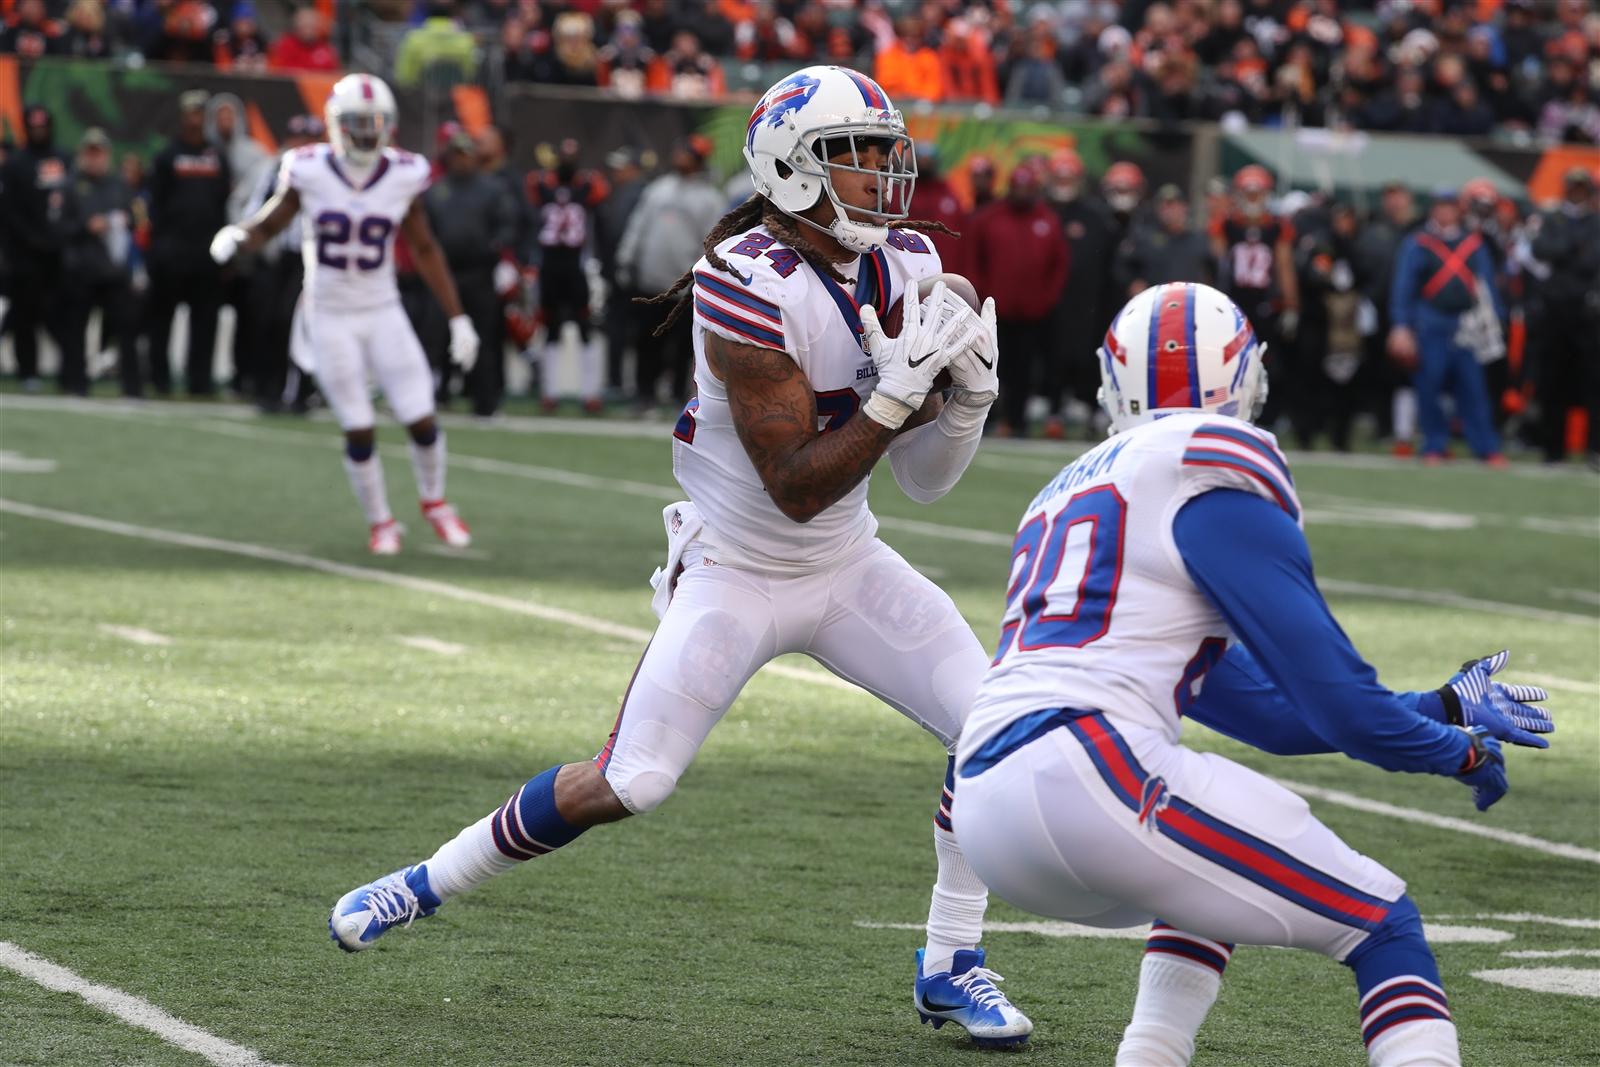 Bills cornerback Stephon Gilmore makes an interception against the Bengals. (James P. McCoy/Buffalo News)